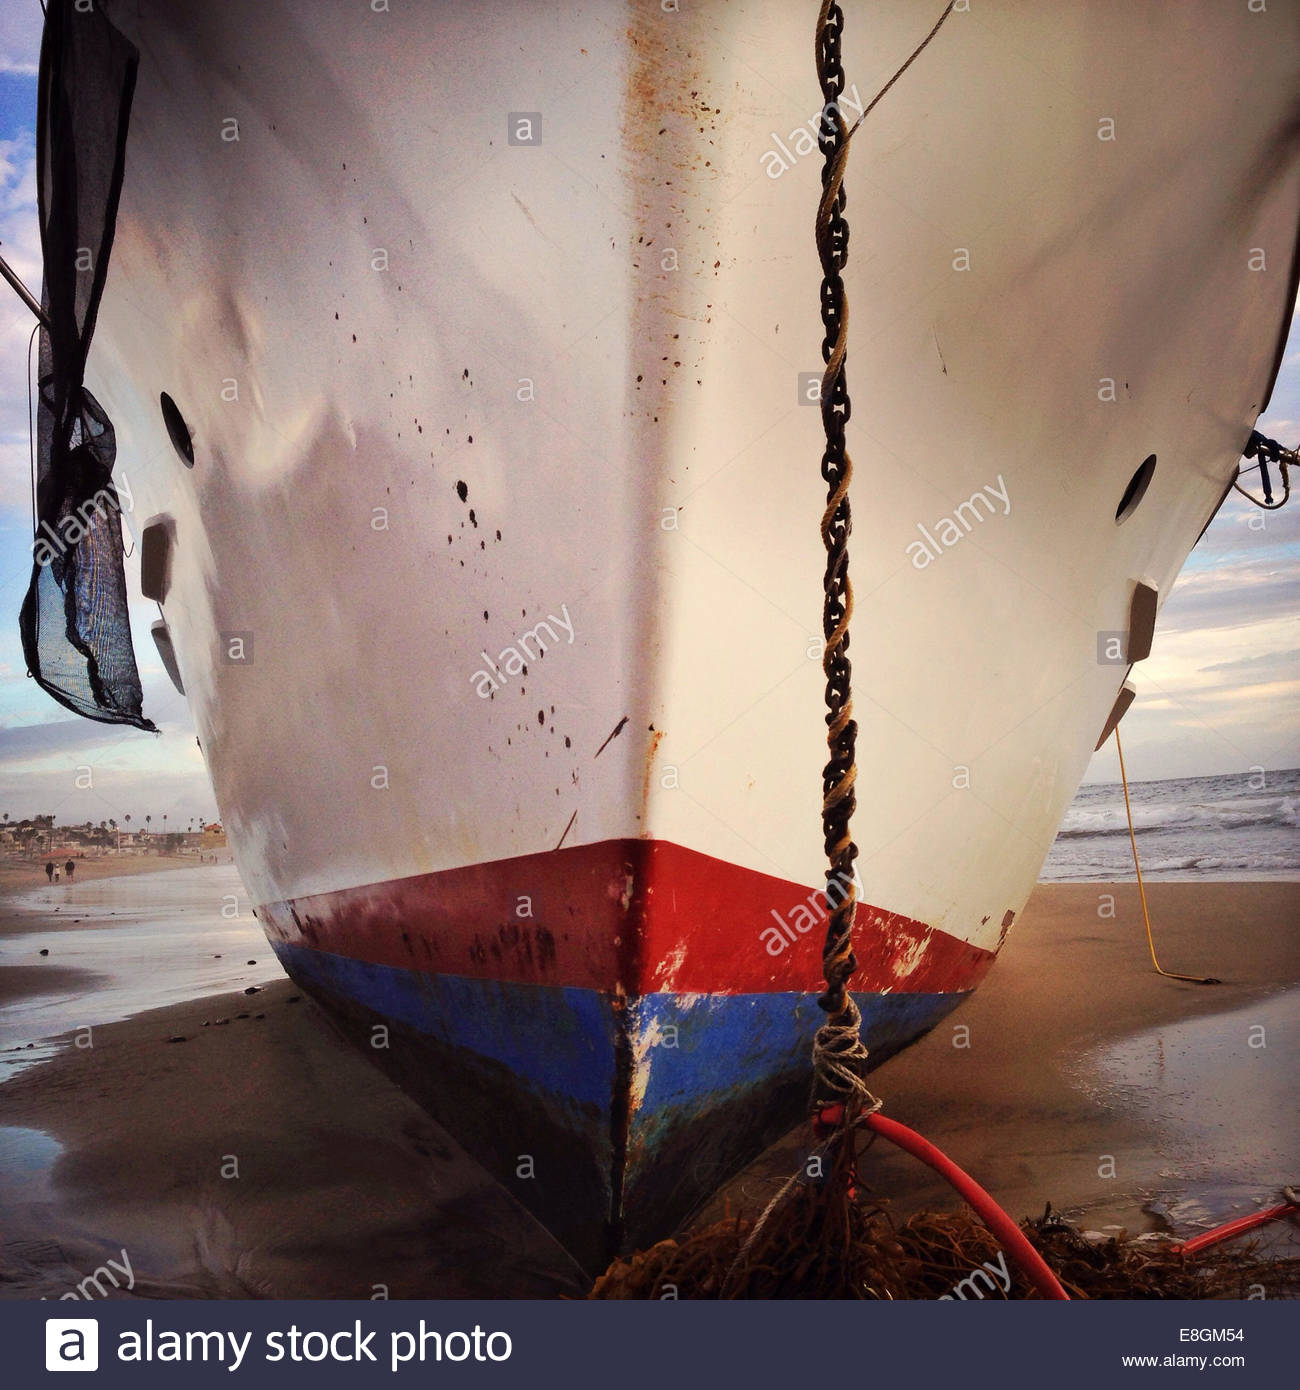 Nahaufnahme der Bug des Bootes am Strand Stockbild